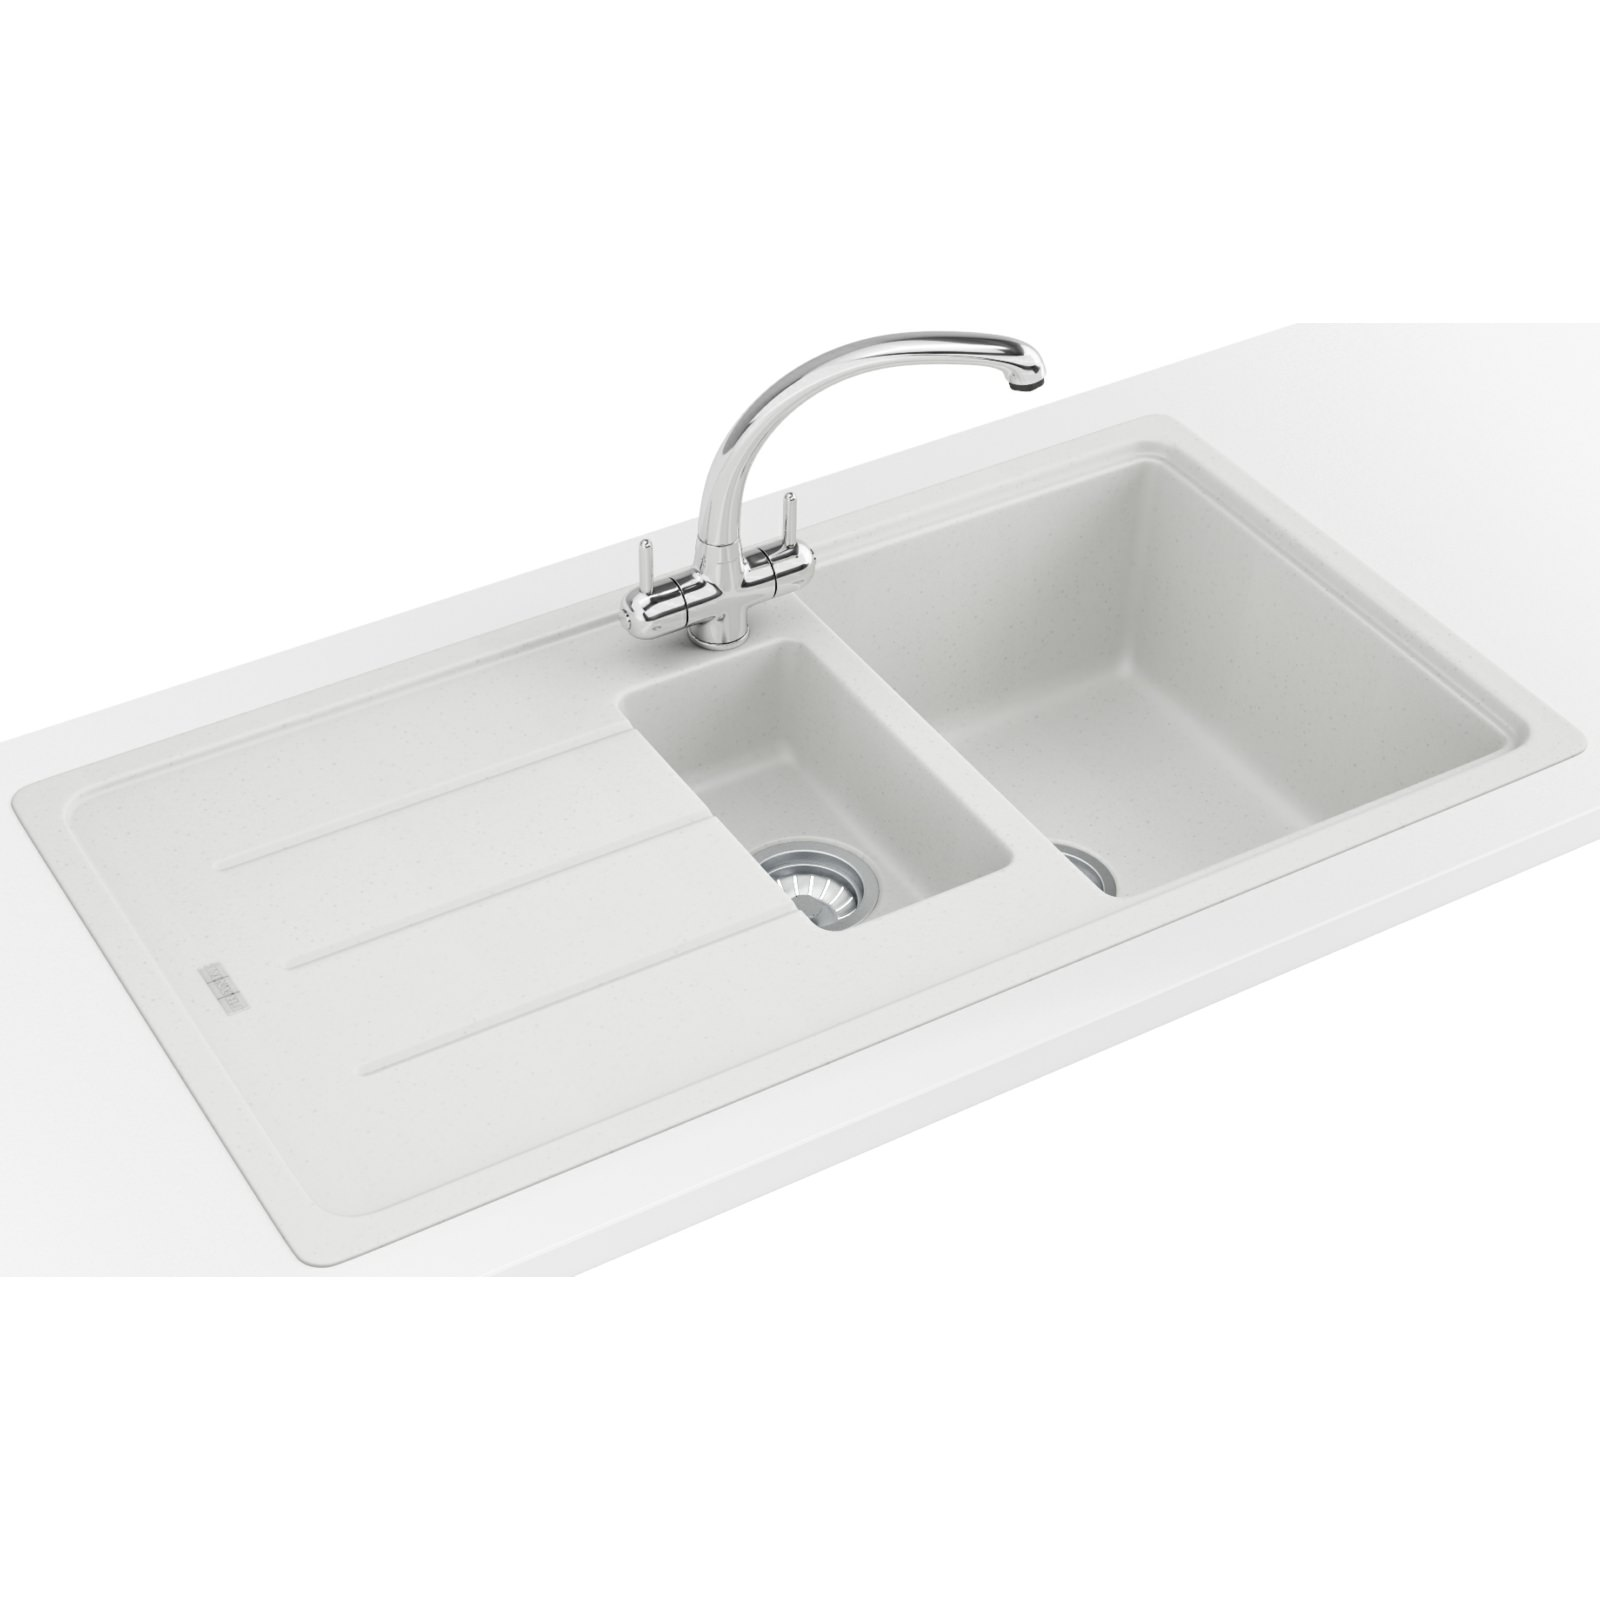 Franke Fragranite Sink Review : Franke Basis Propack BFG 651 Fragranite Polar White Sink And Tap 114 ...